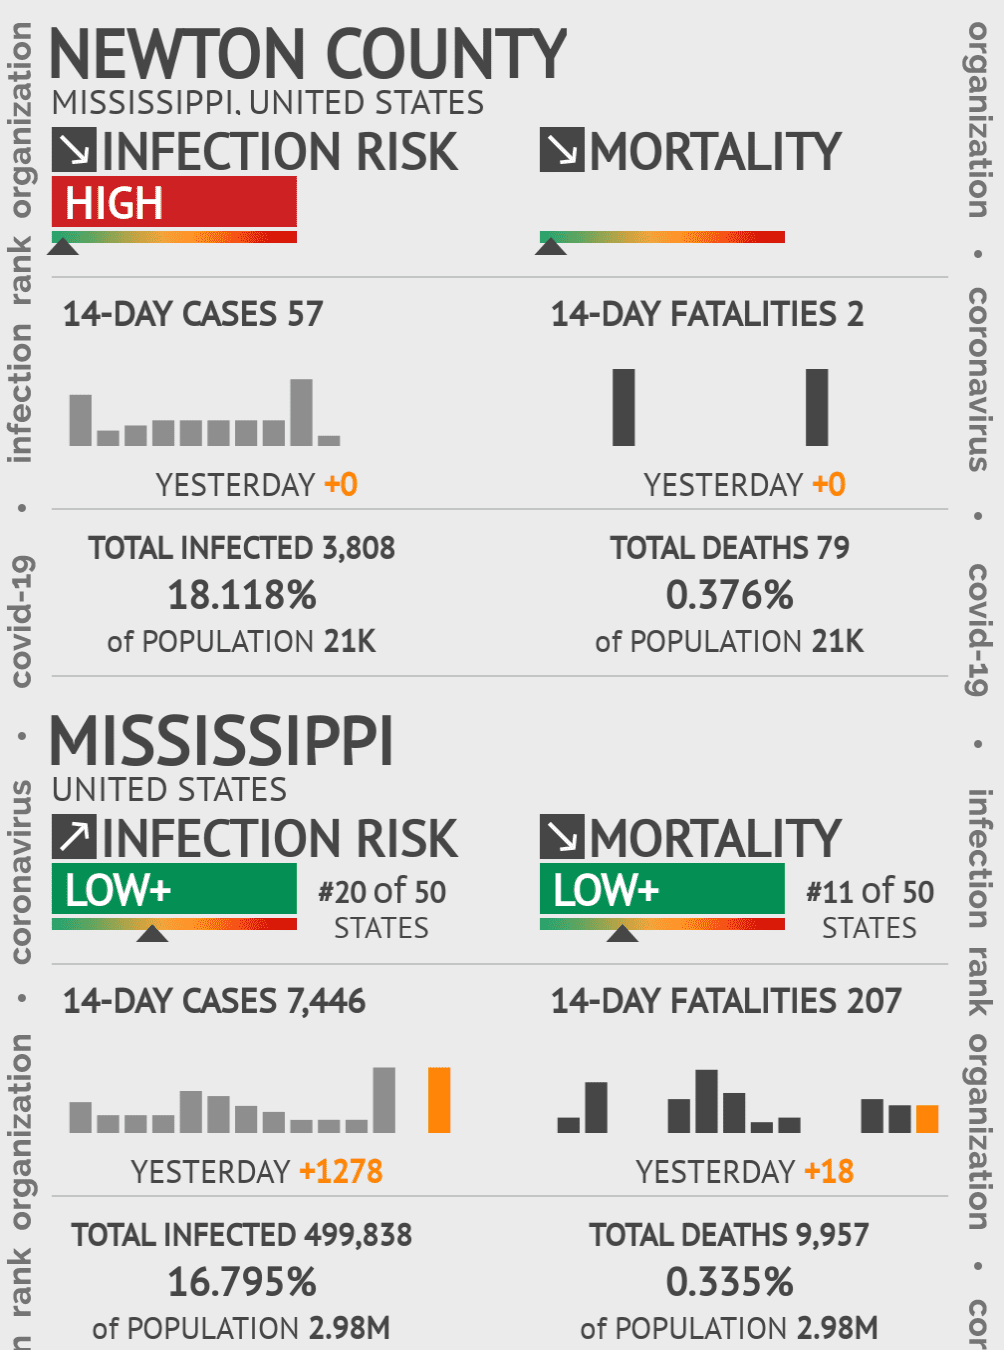 Newton County Coronavirus Covid-19 Risk of Infection on July 24, 2021